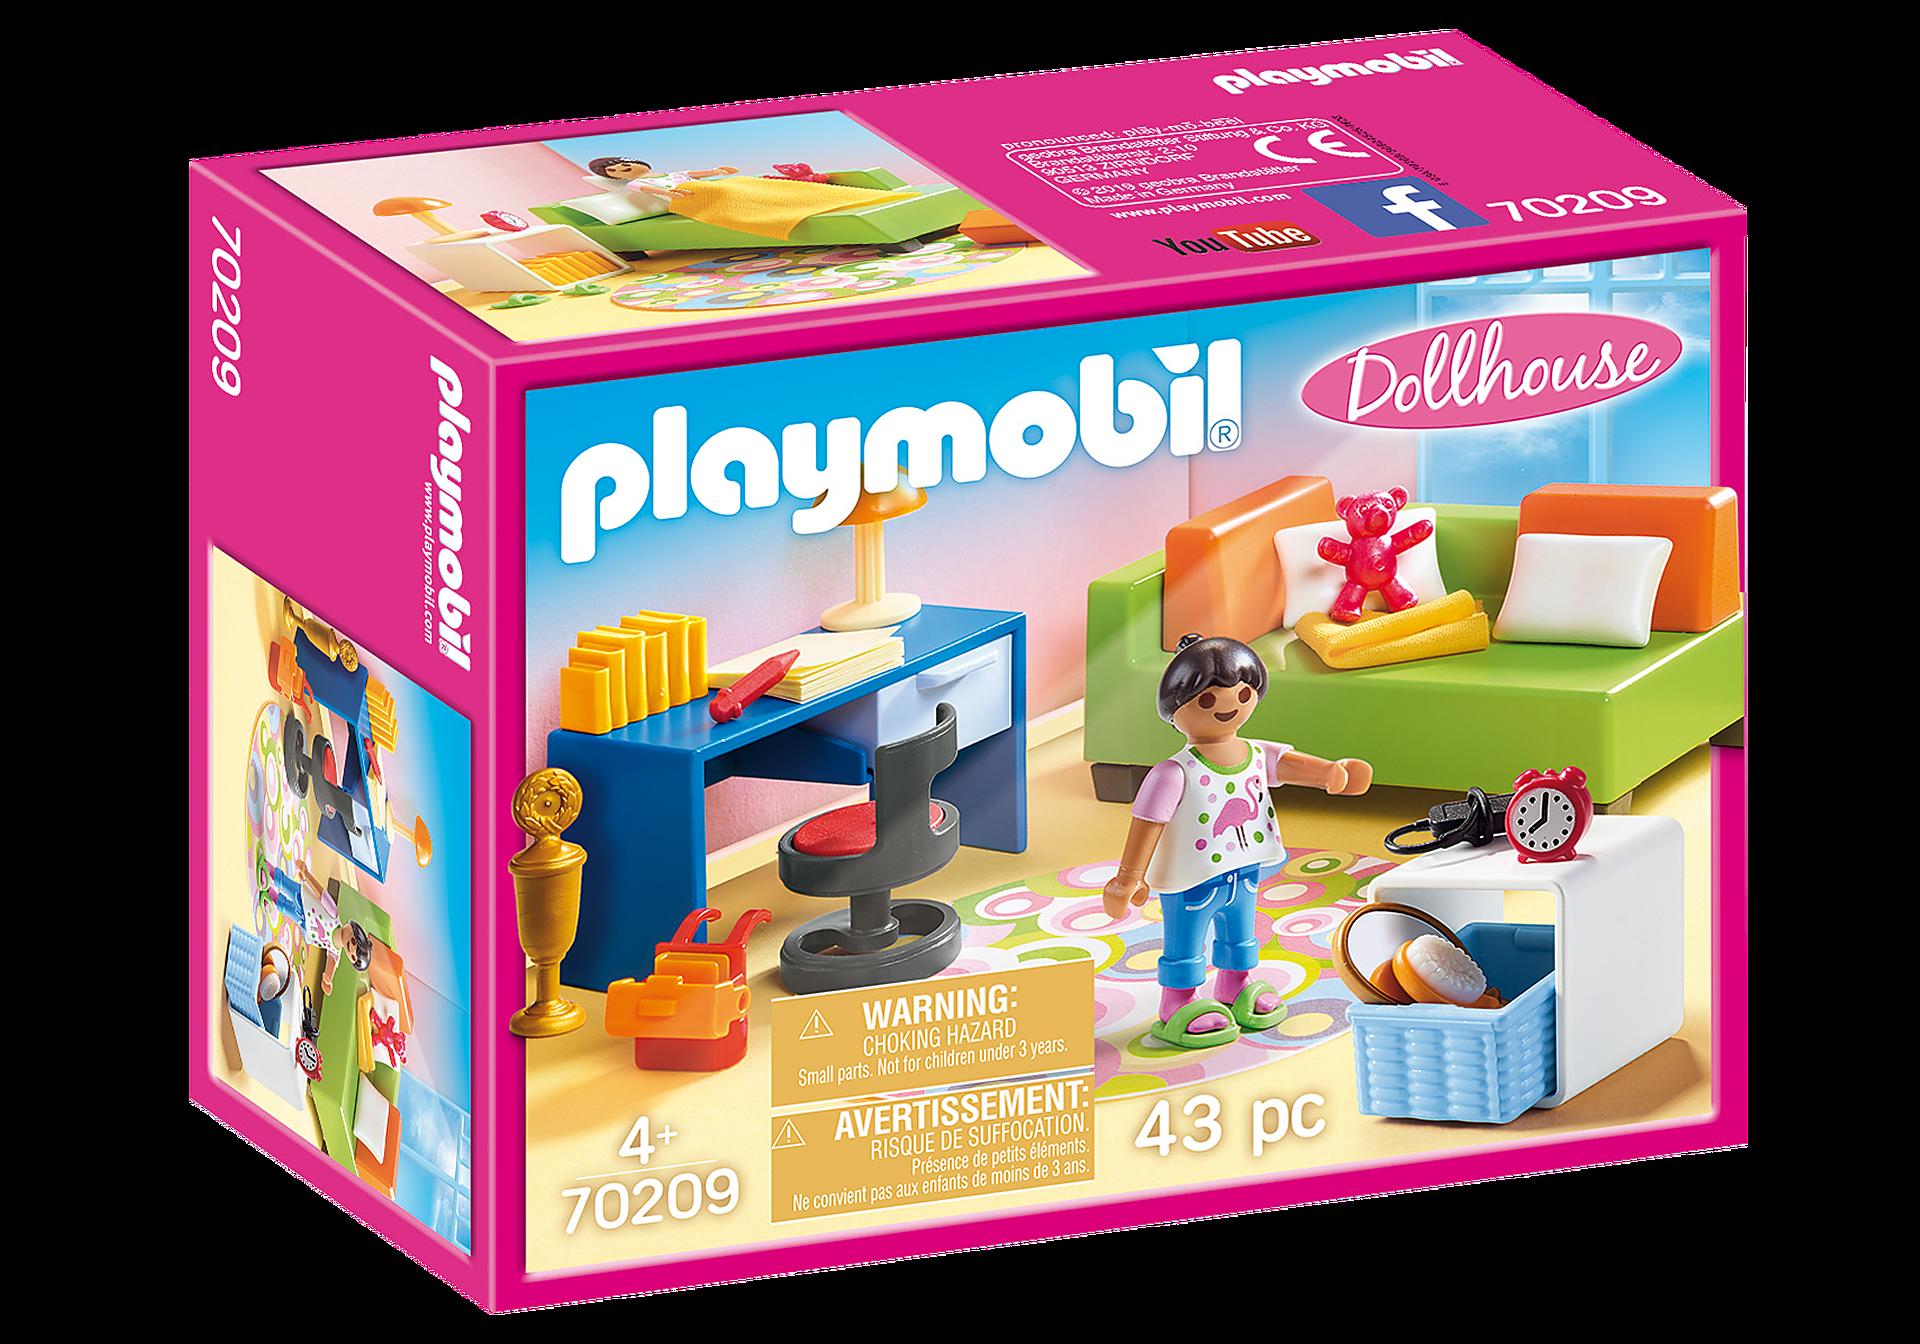 Playmobil - Teenagers room (70209)